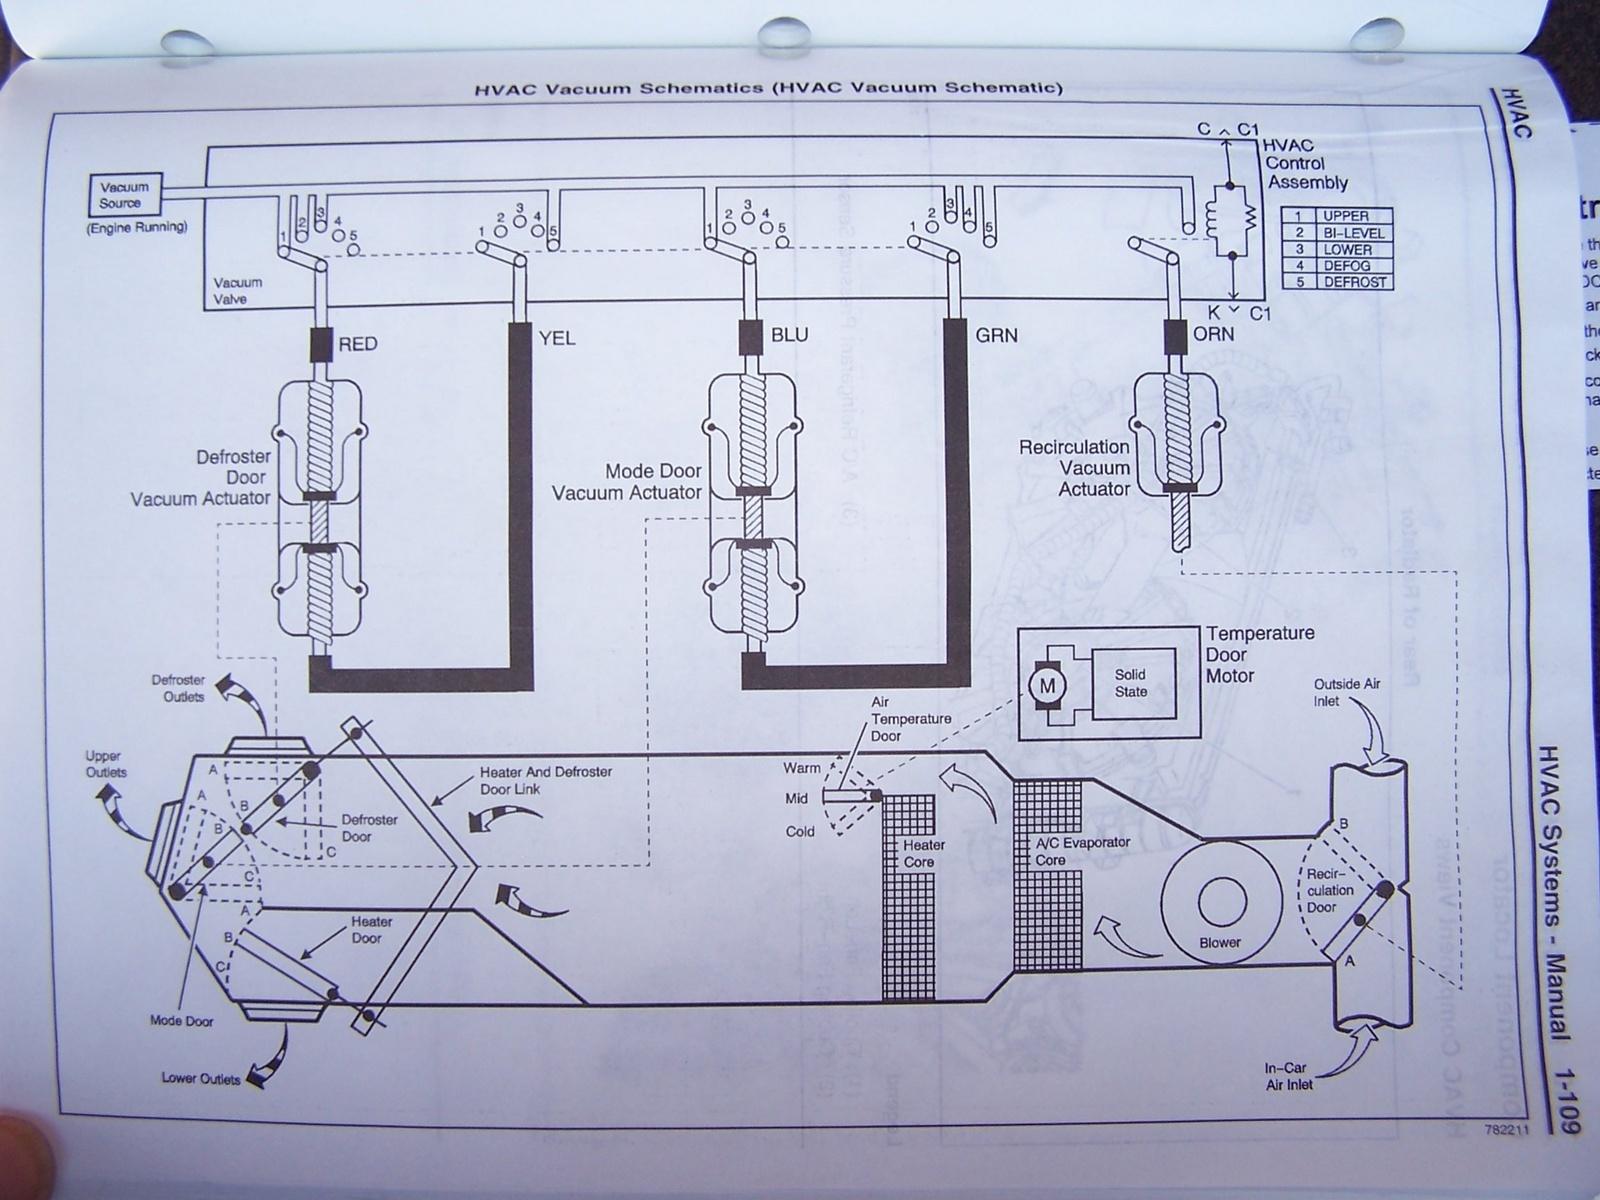 95 Bonneville Wiring Diagrams Gmc Sierra 1500 Questions I Have No Air Flow Through